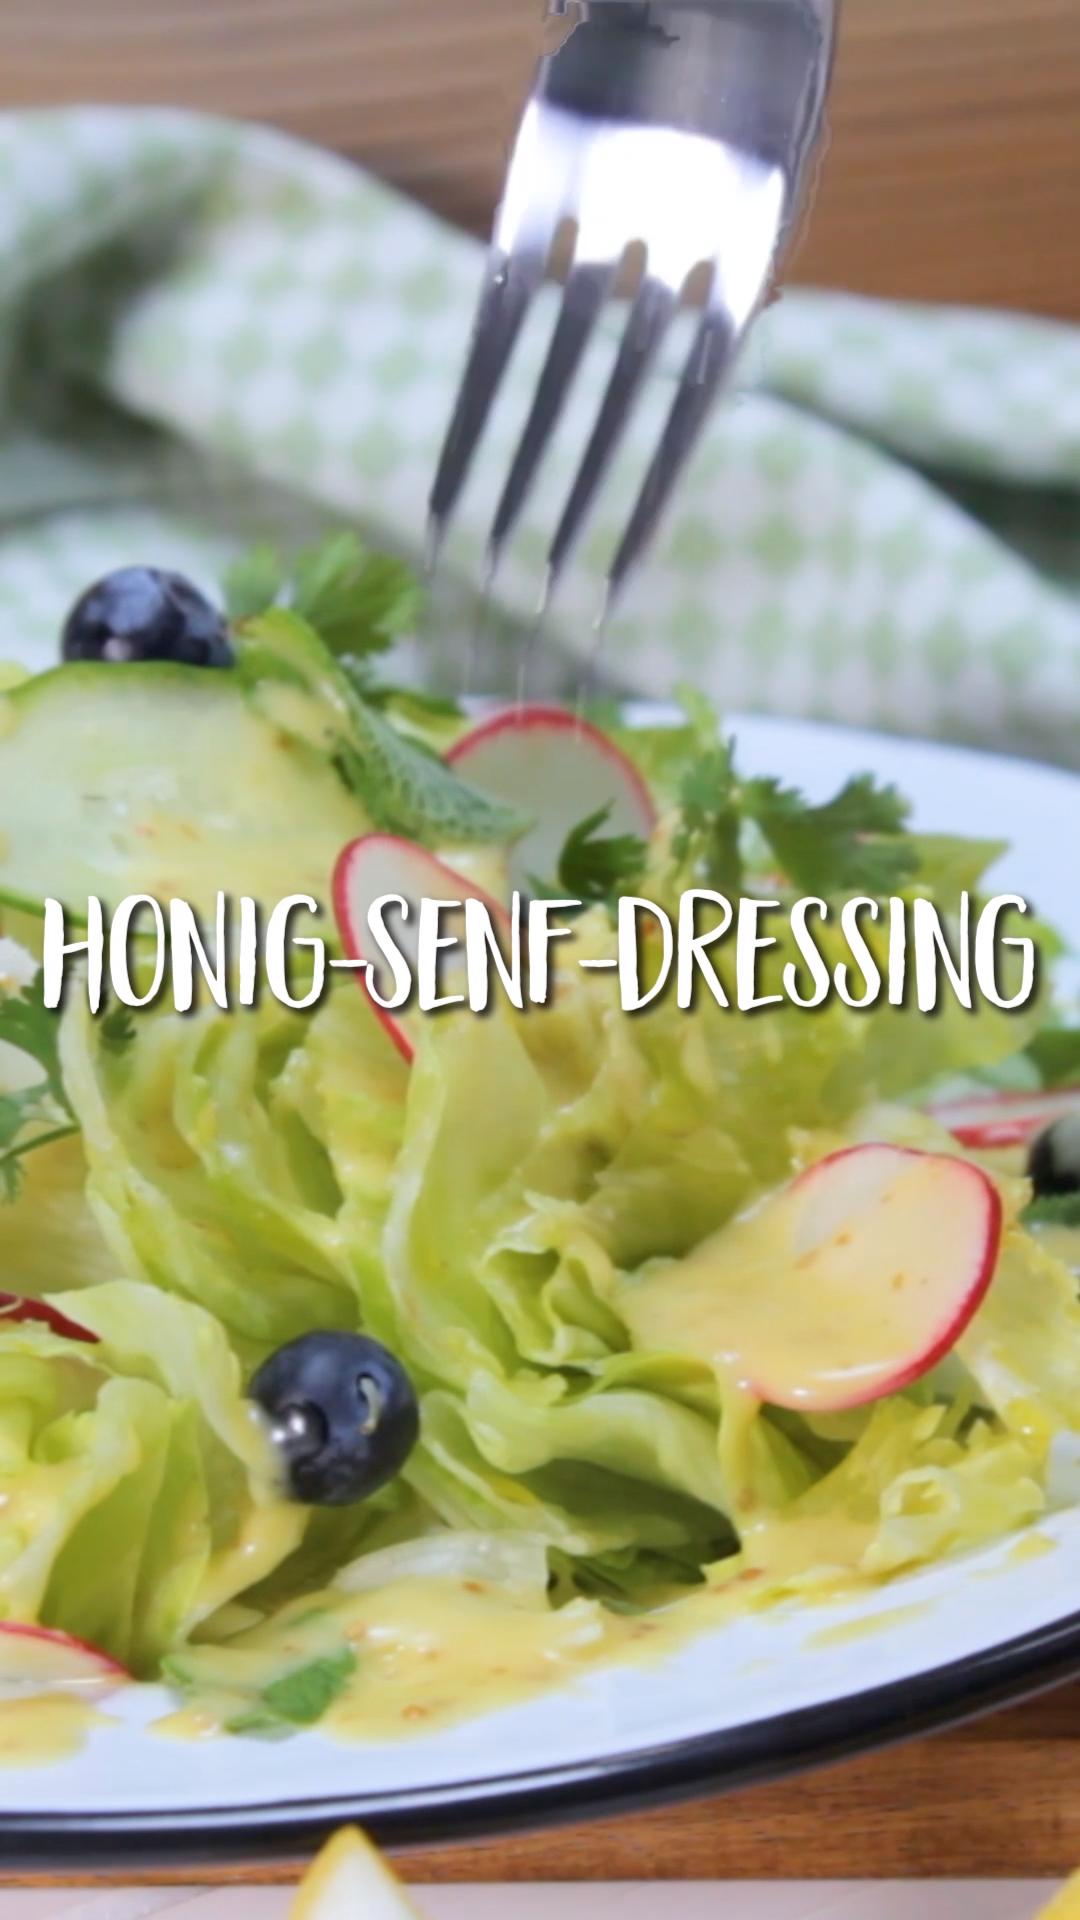 Honig-Senf-Dressing